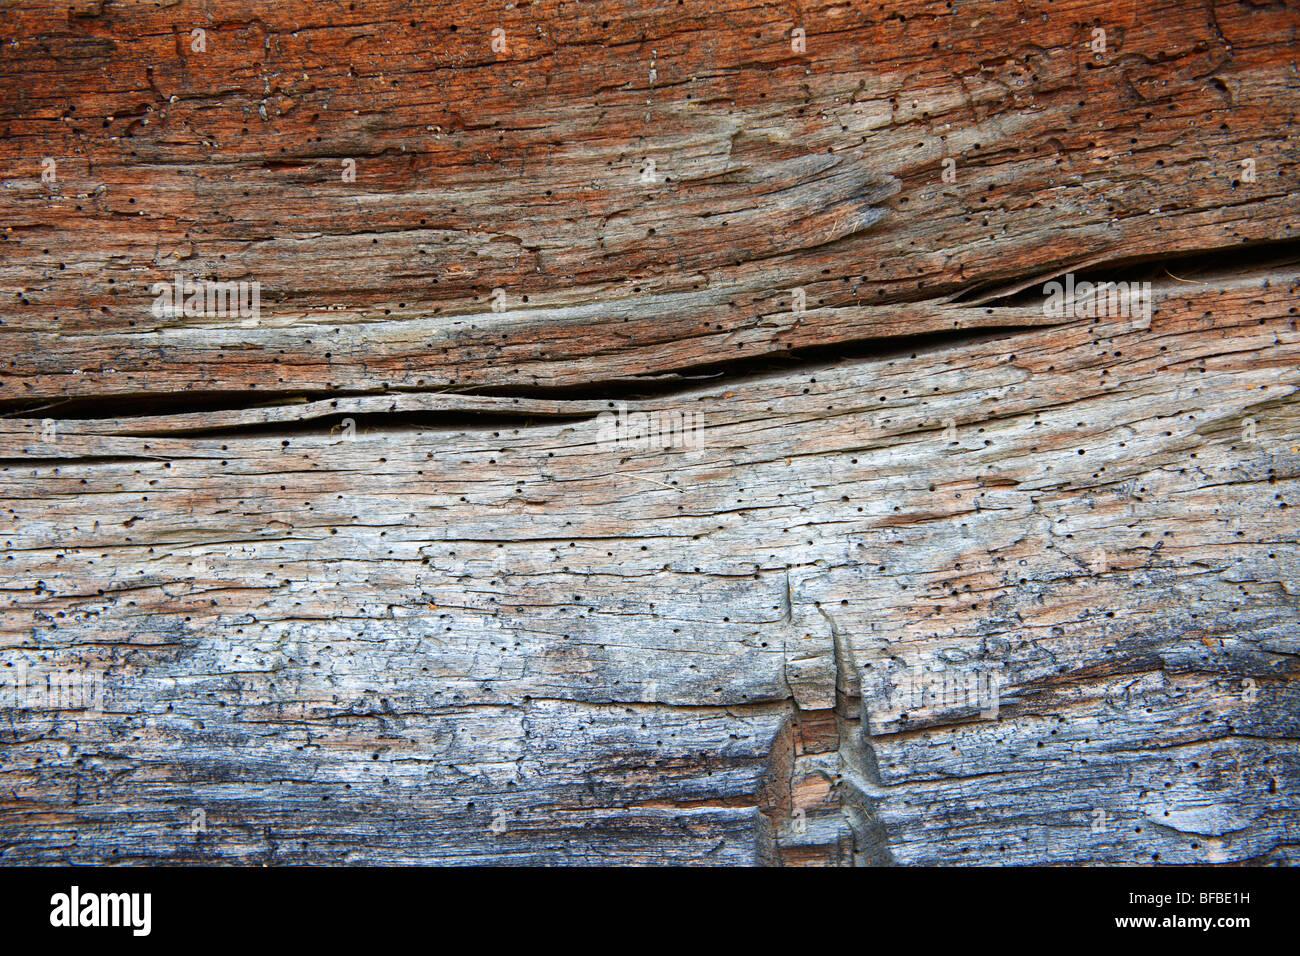 Texturas naturales - antiguo madera desgastada texrure Imagen De Stock